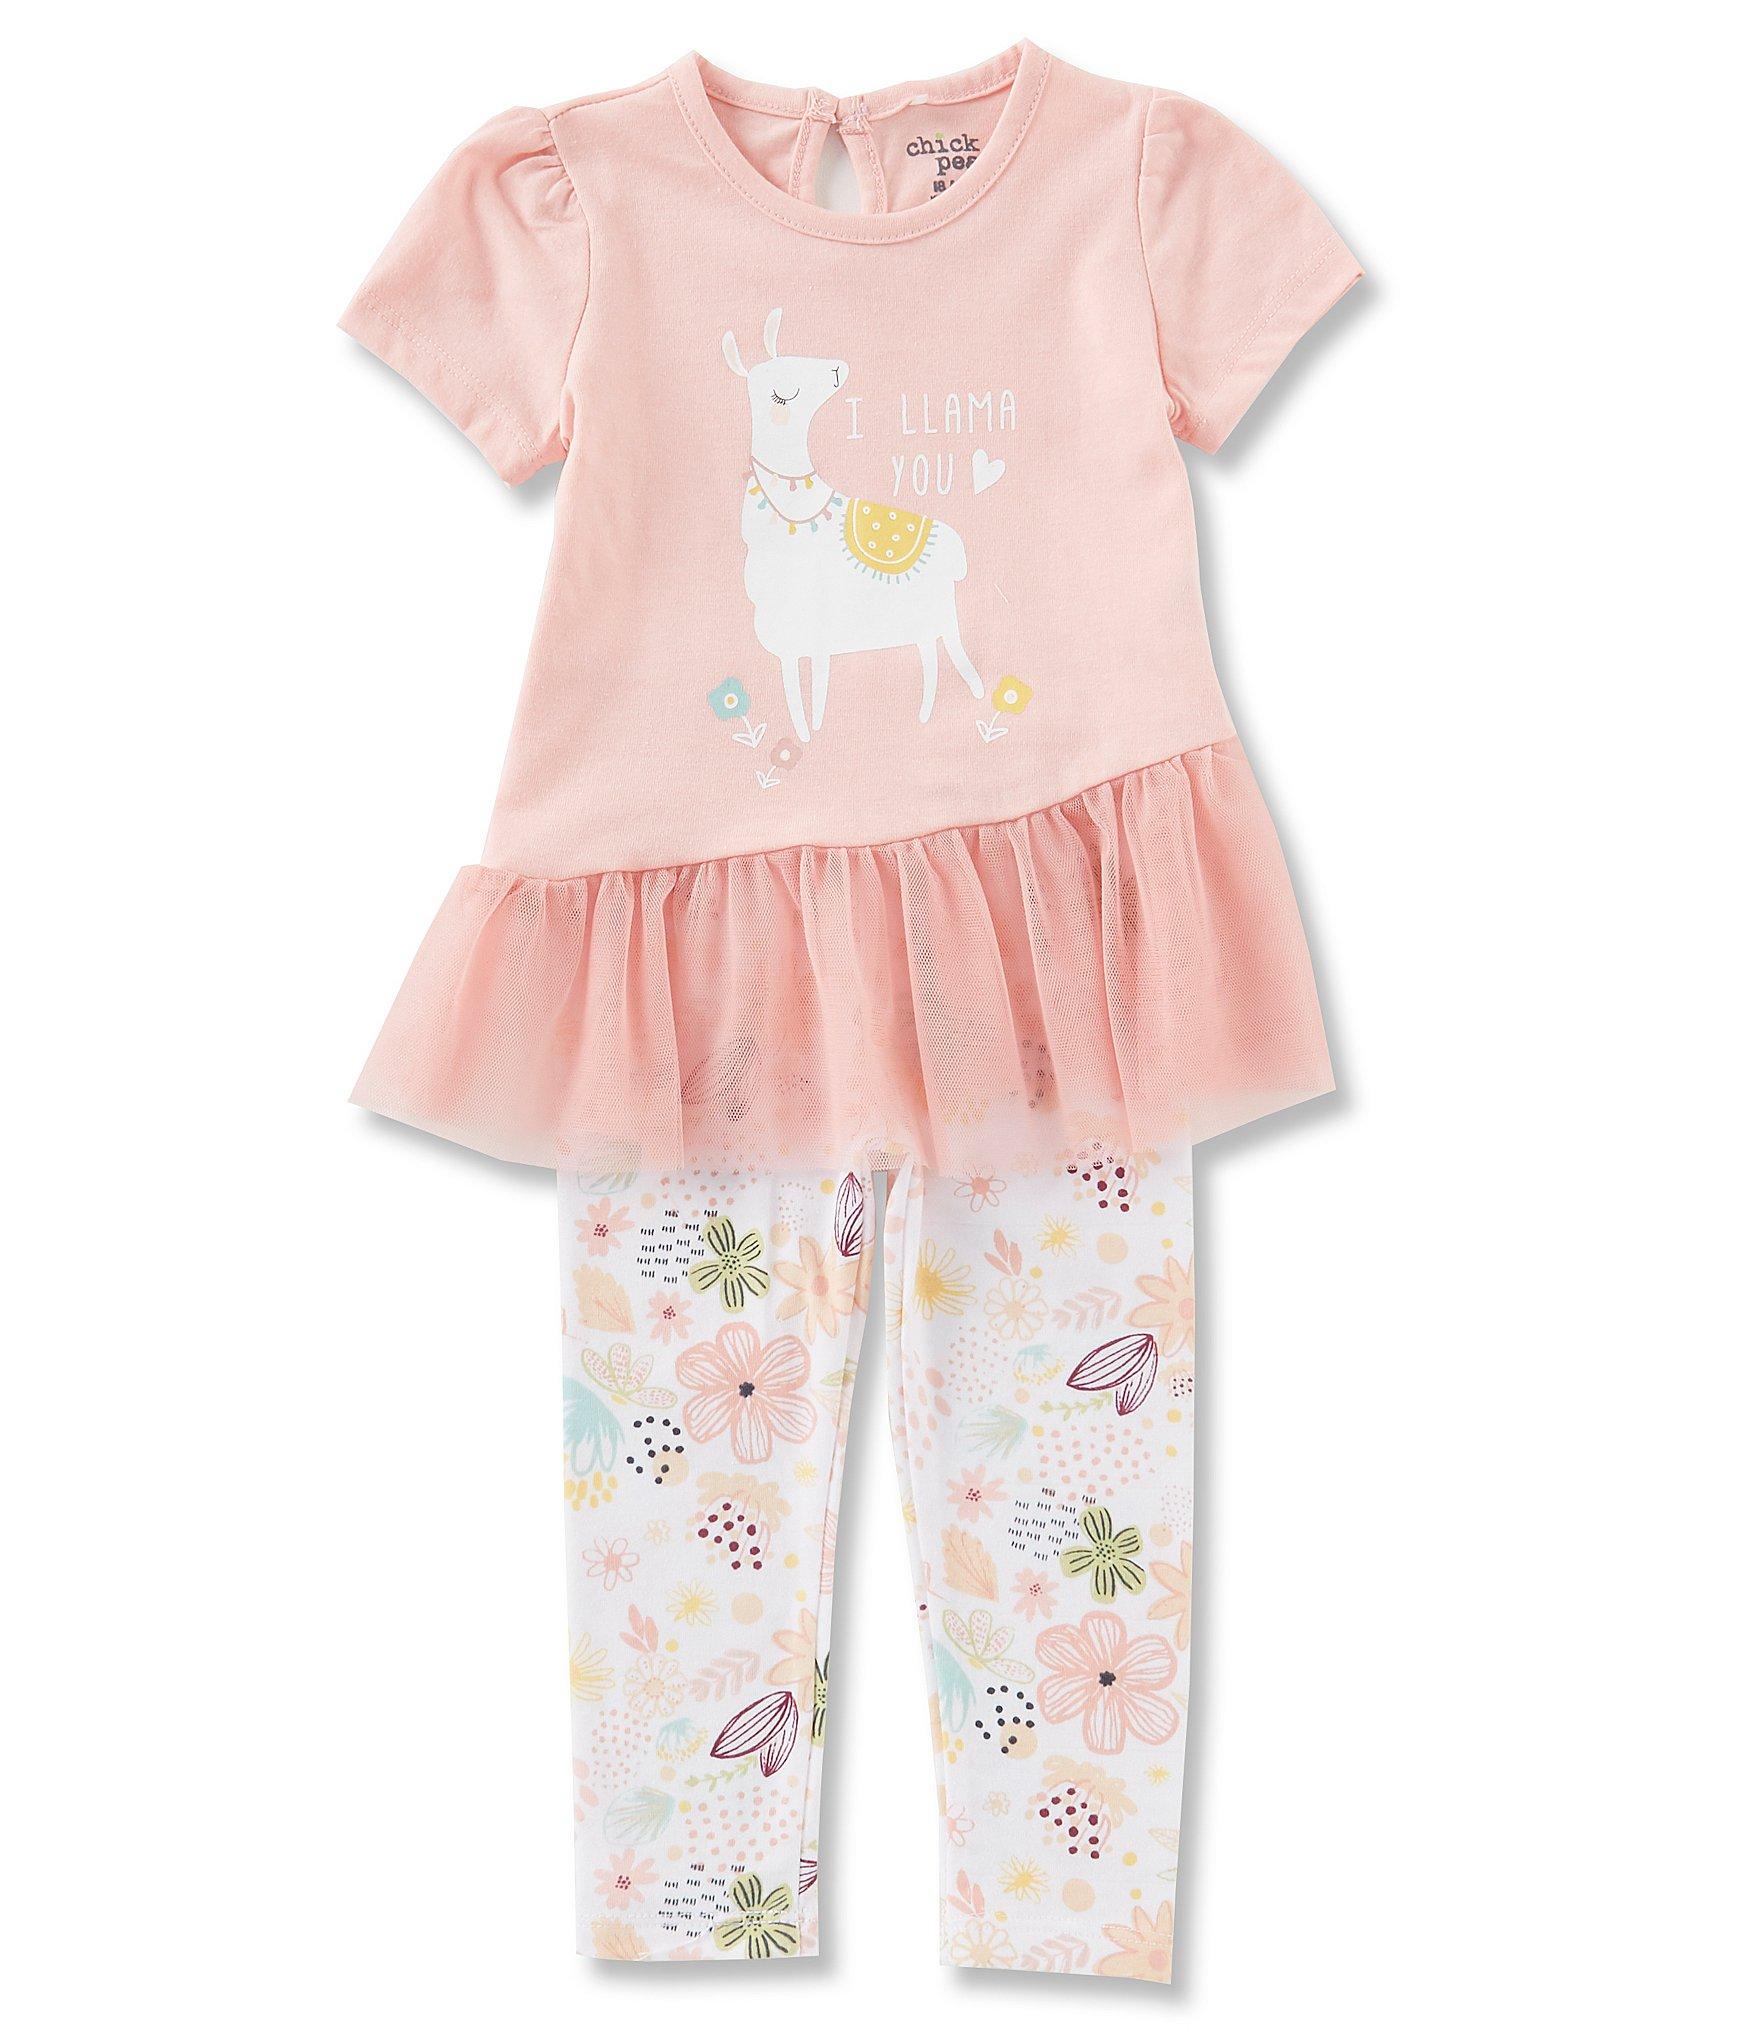 781e699aa Chick Pea Baby Girls 12-24 Months Llama Short Sleeve Tunic   Printed  Leggings Set